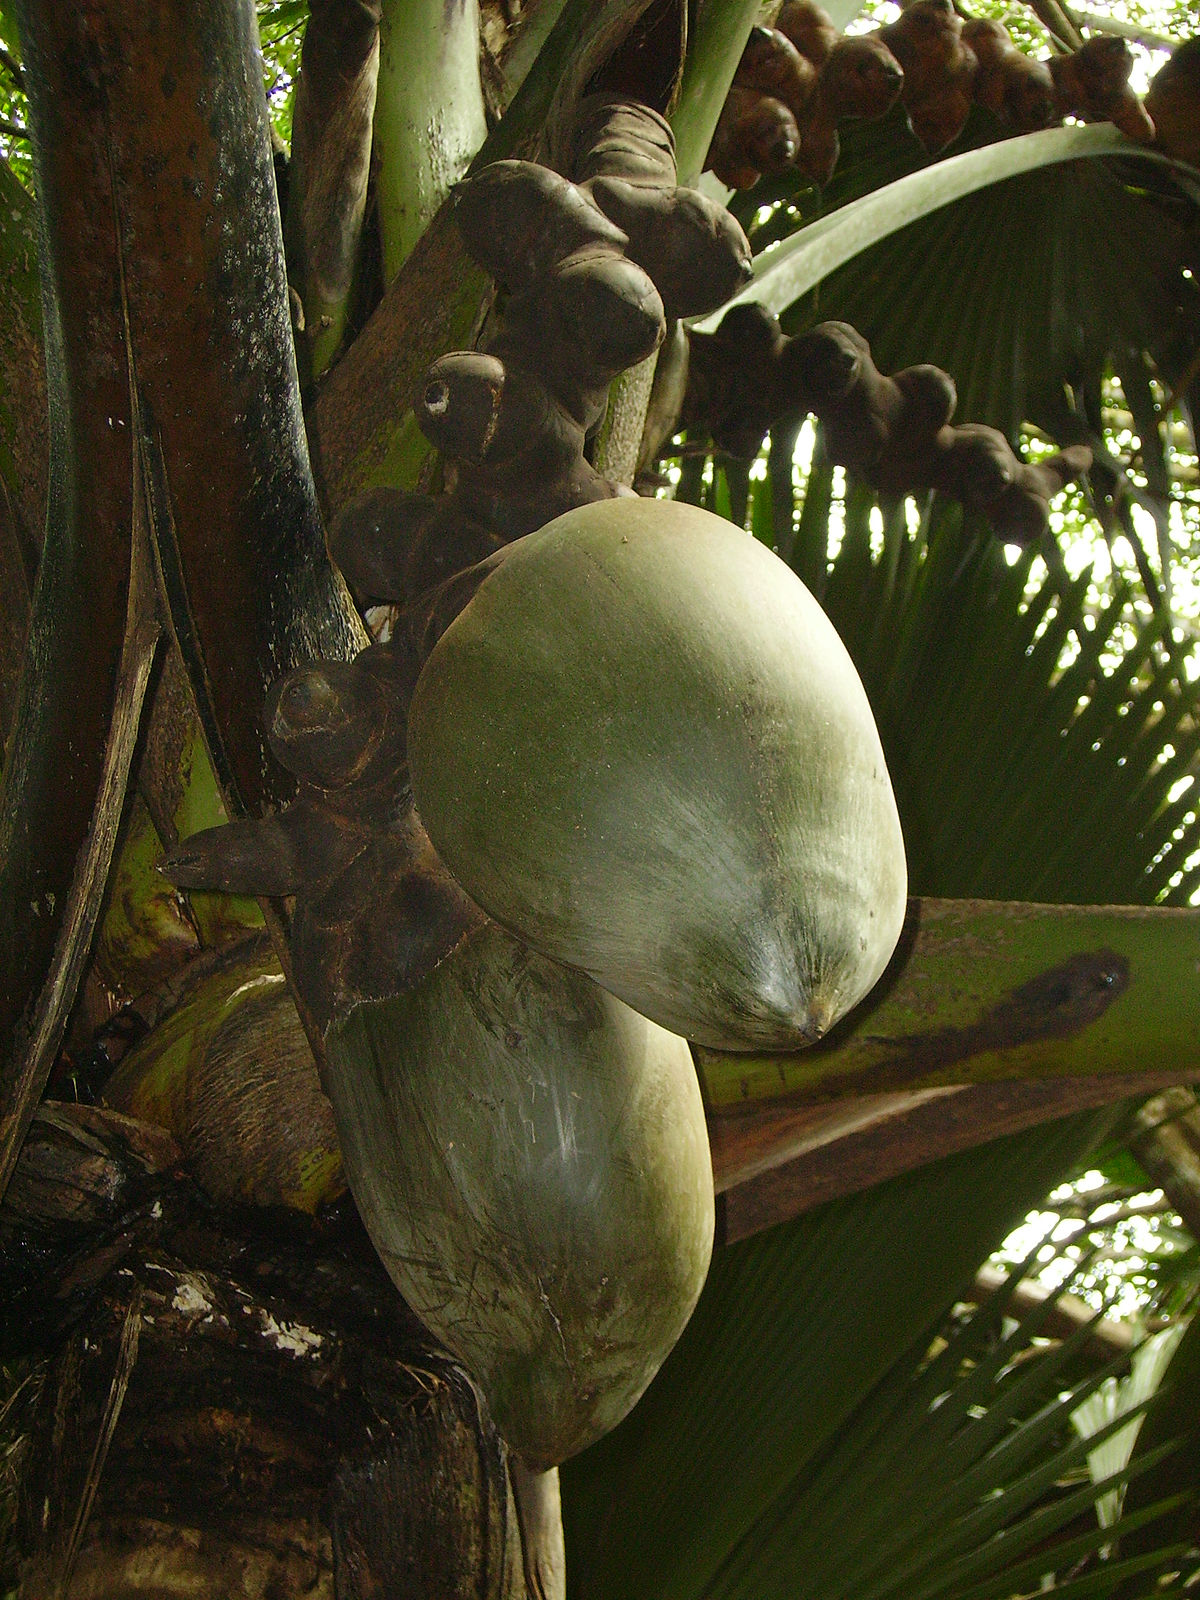 Lodoicea - Wikipedia